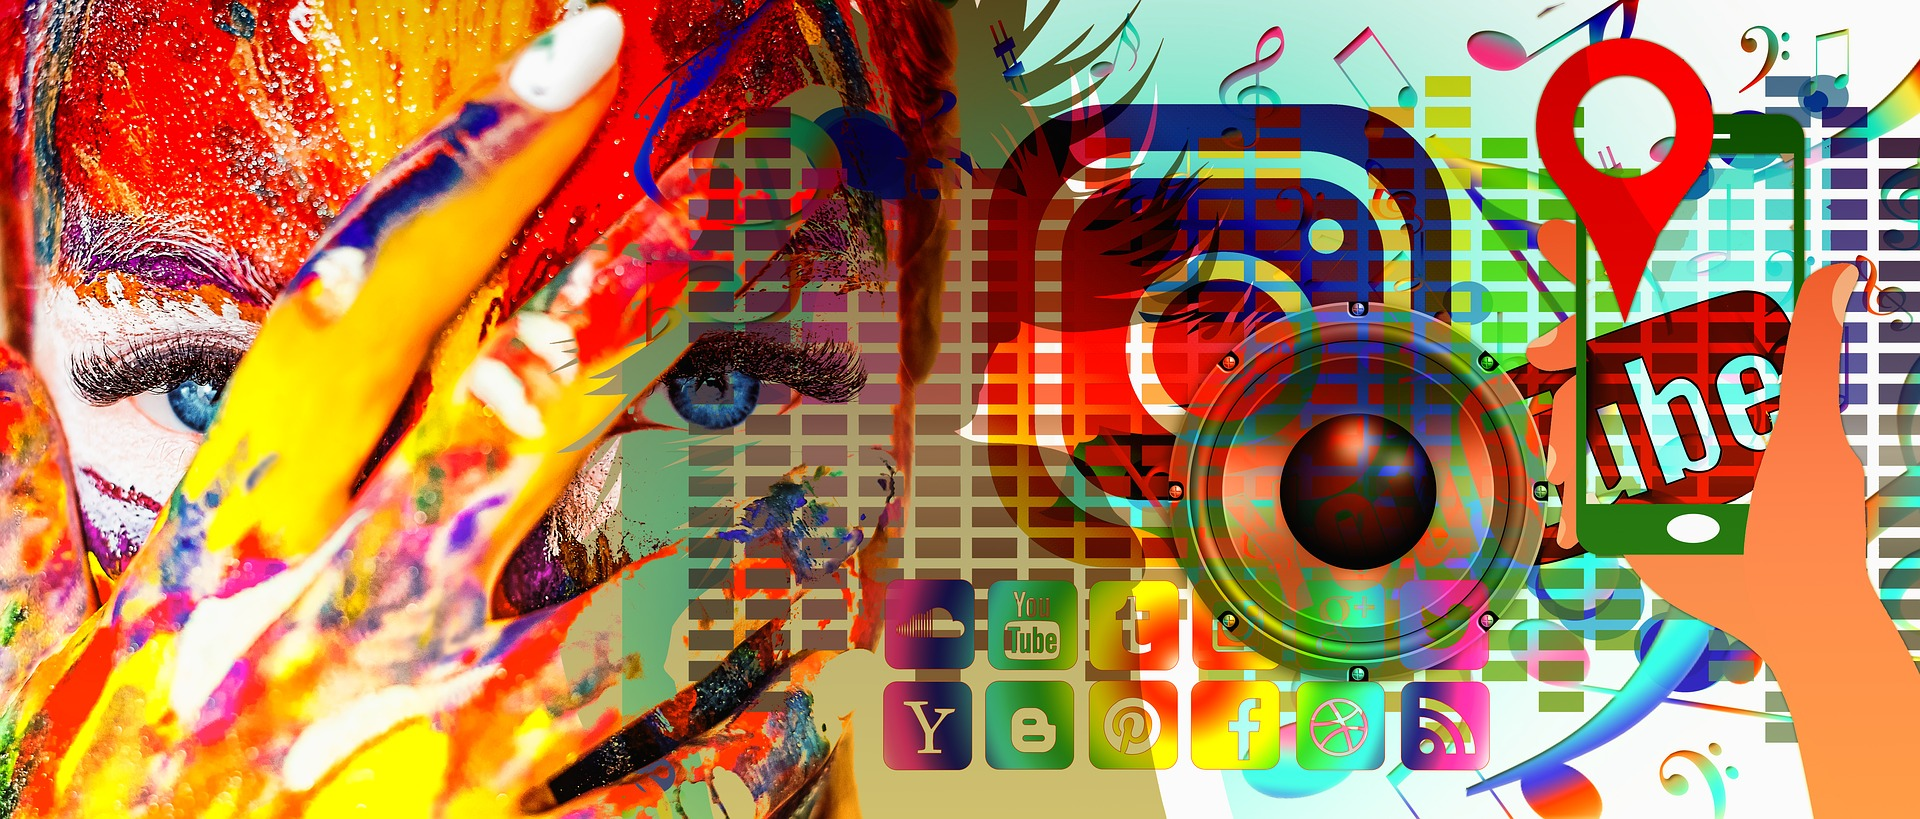 Internet: veni, vidi, vici